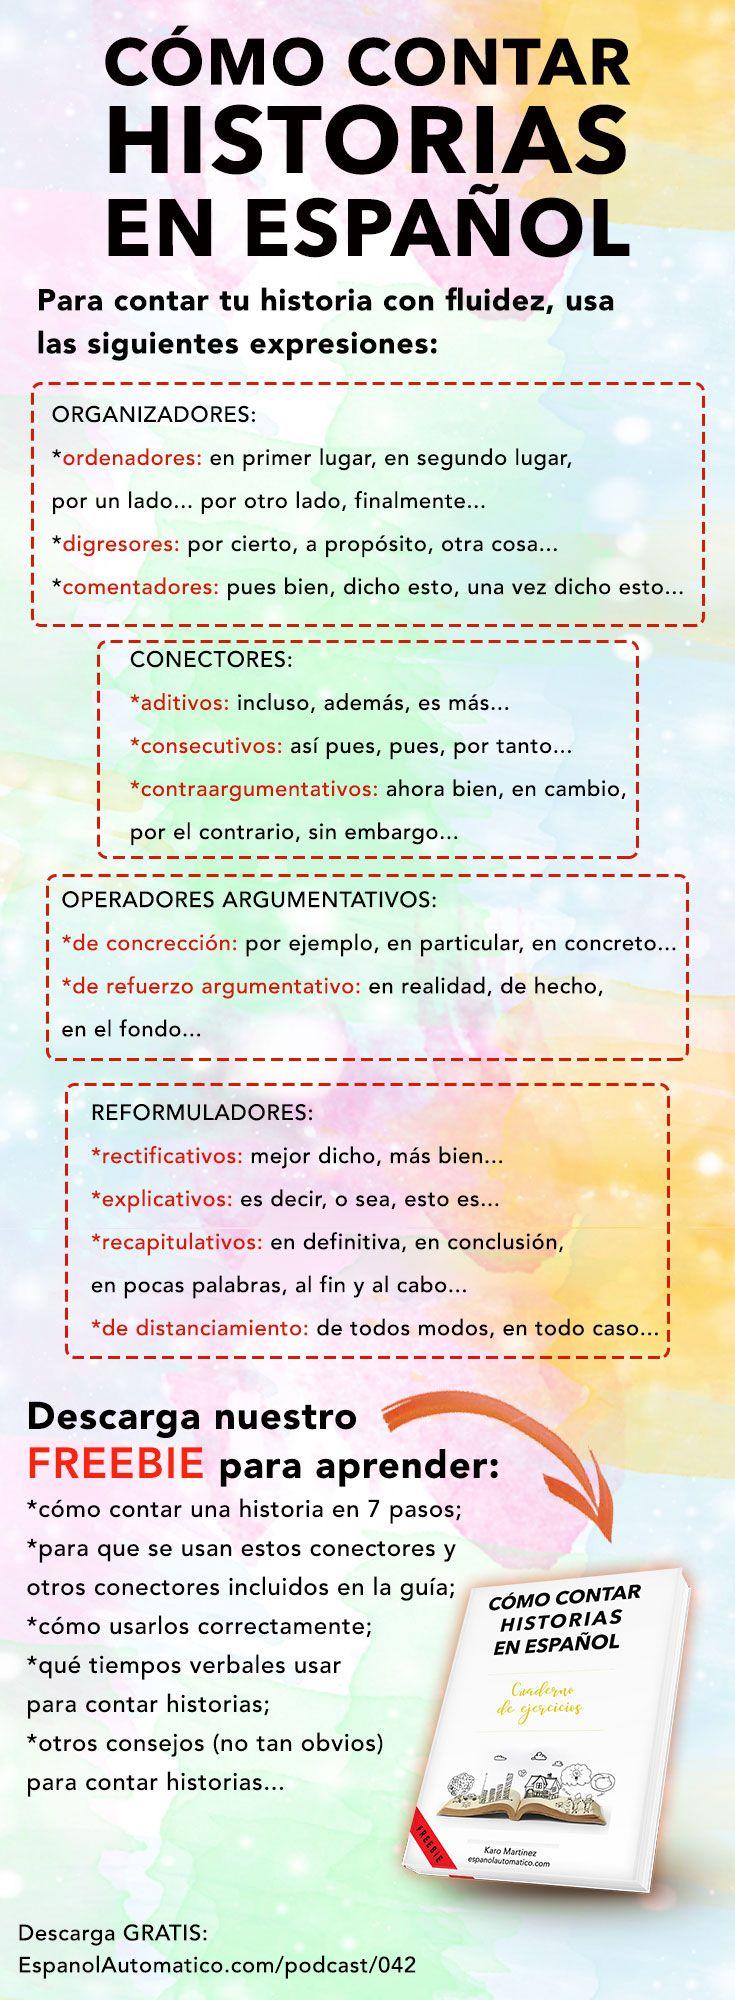 Examen writing 1 bachillerato anahuac